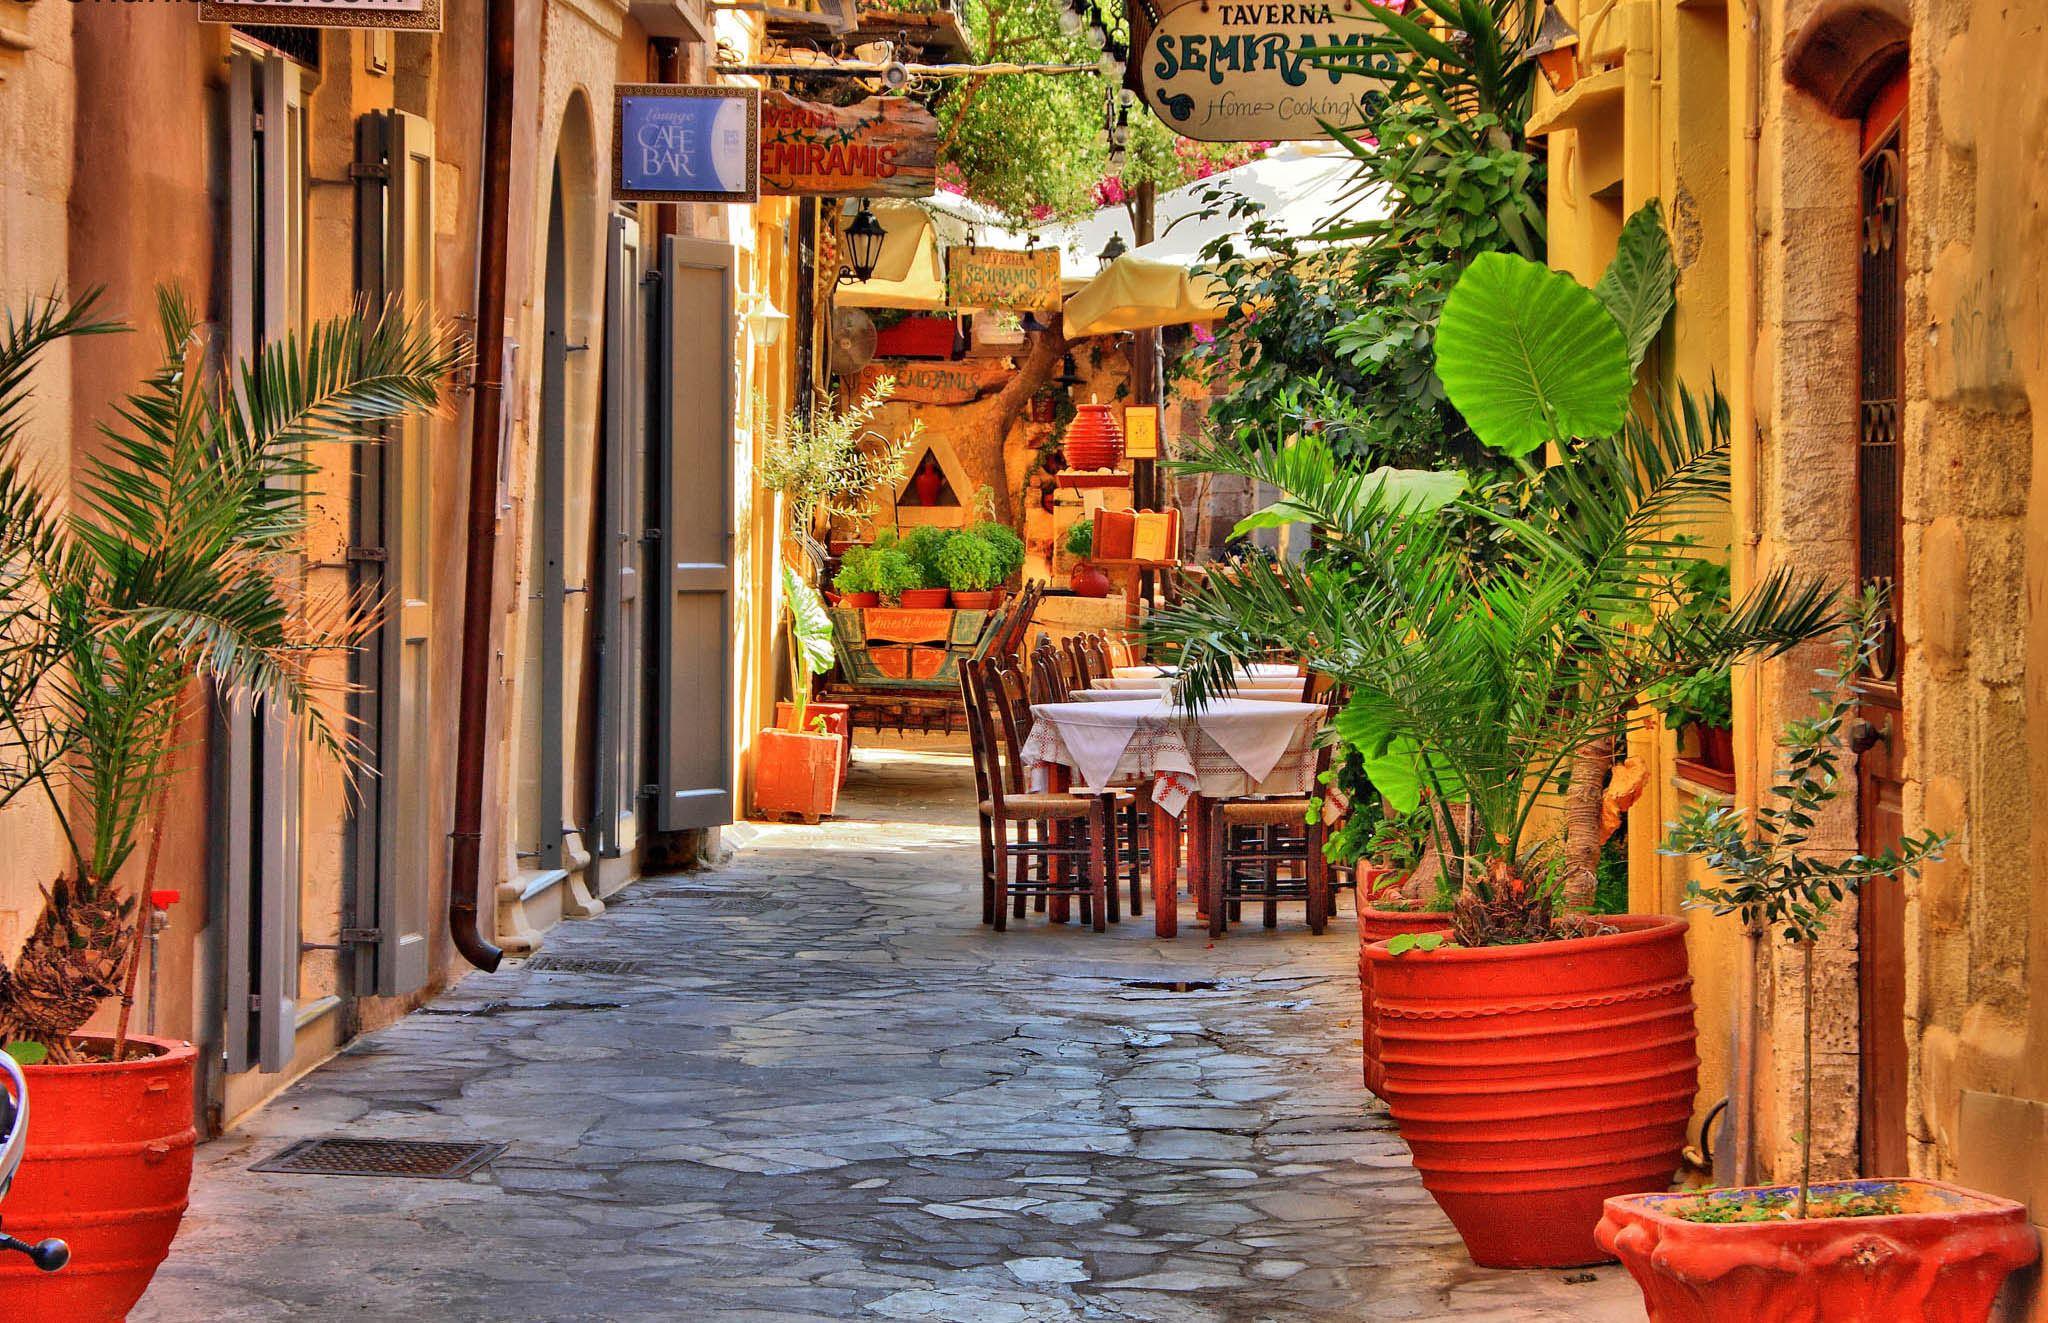 chania streett.jpg